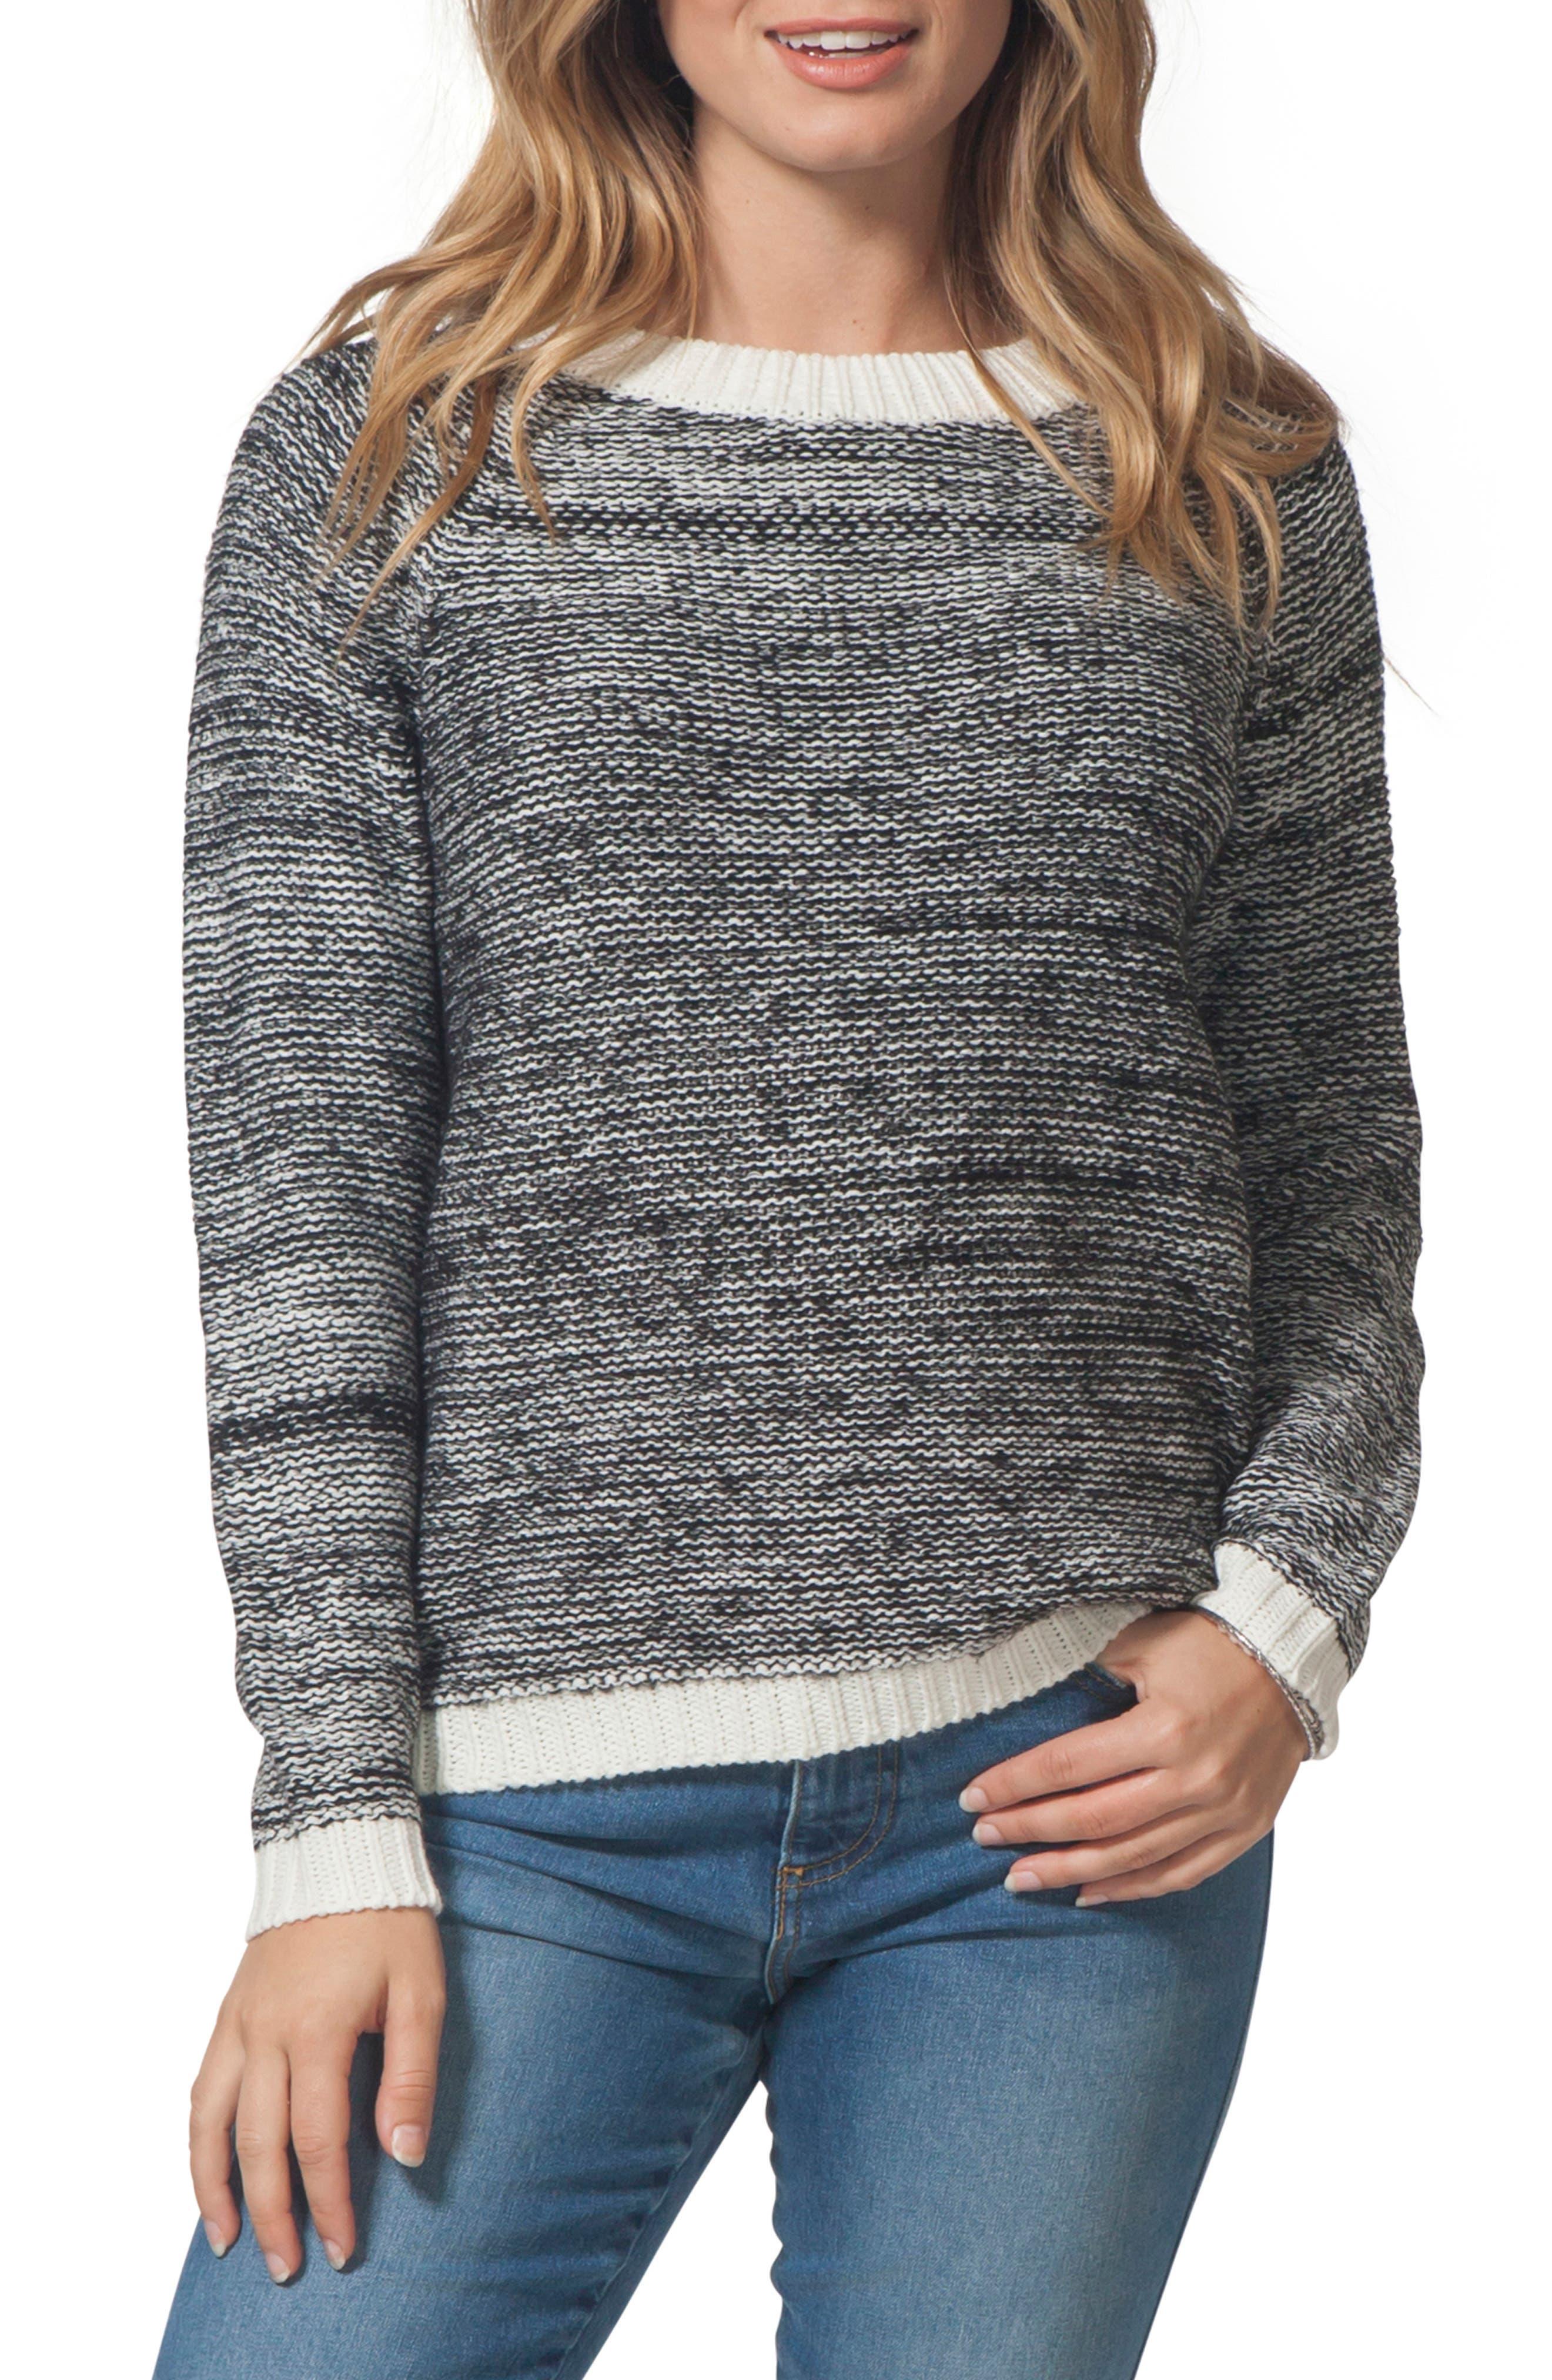 Beachside Crewneck Sweater,                             Main thumbnail 1, color,                             CASTOR GRAY